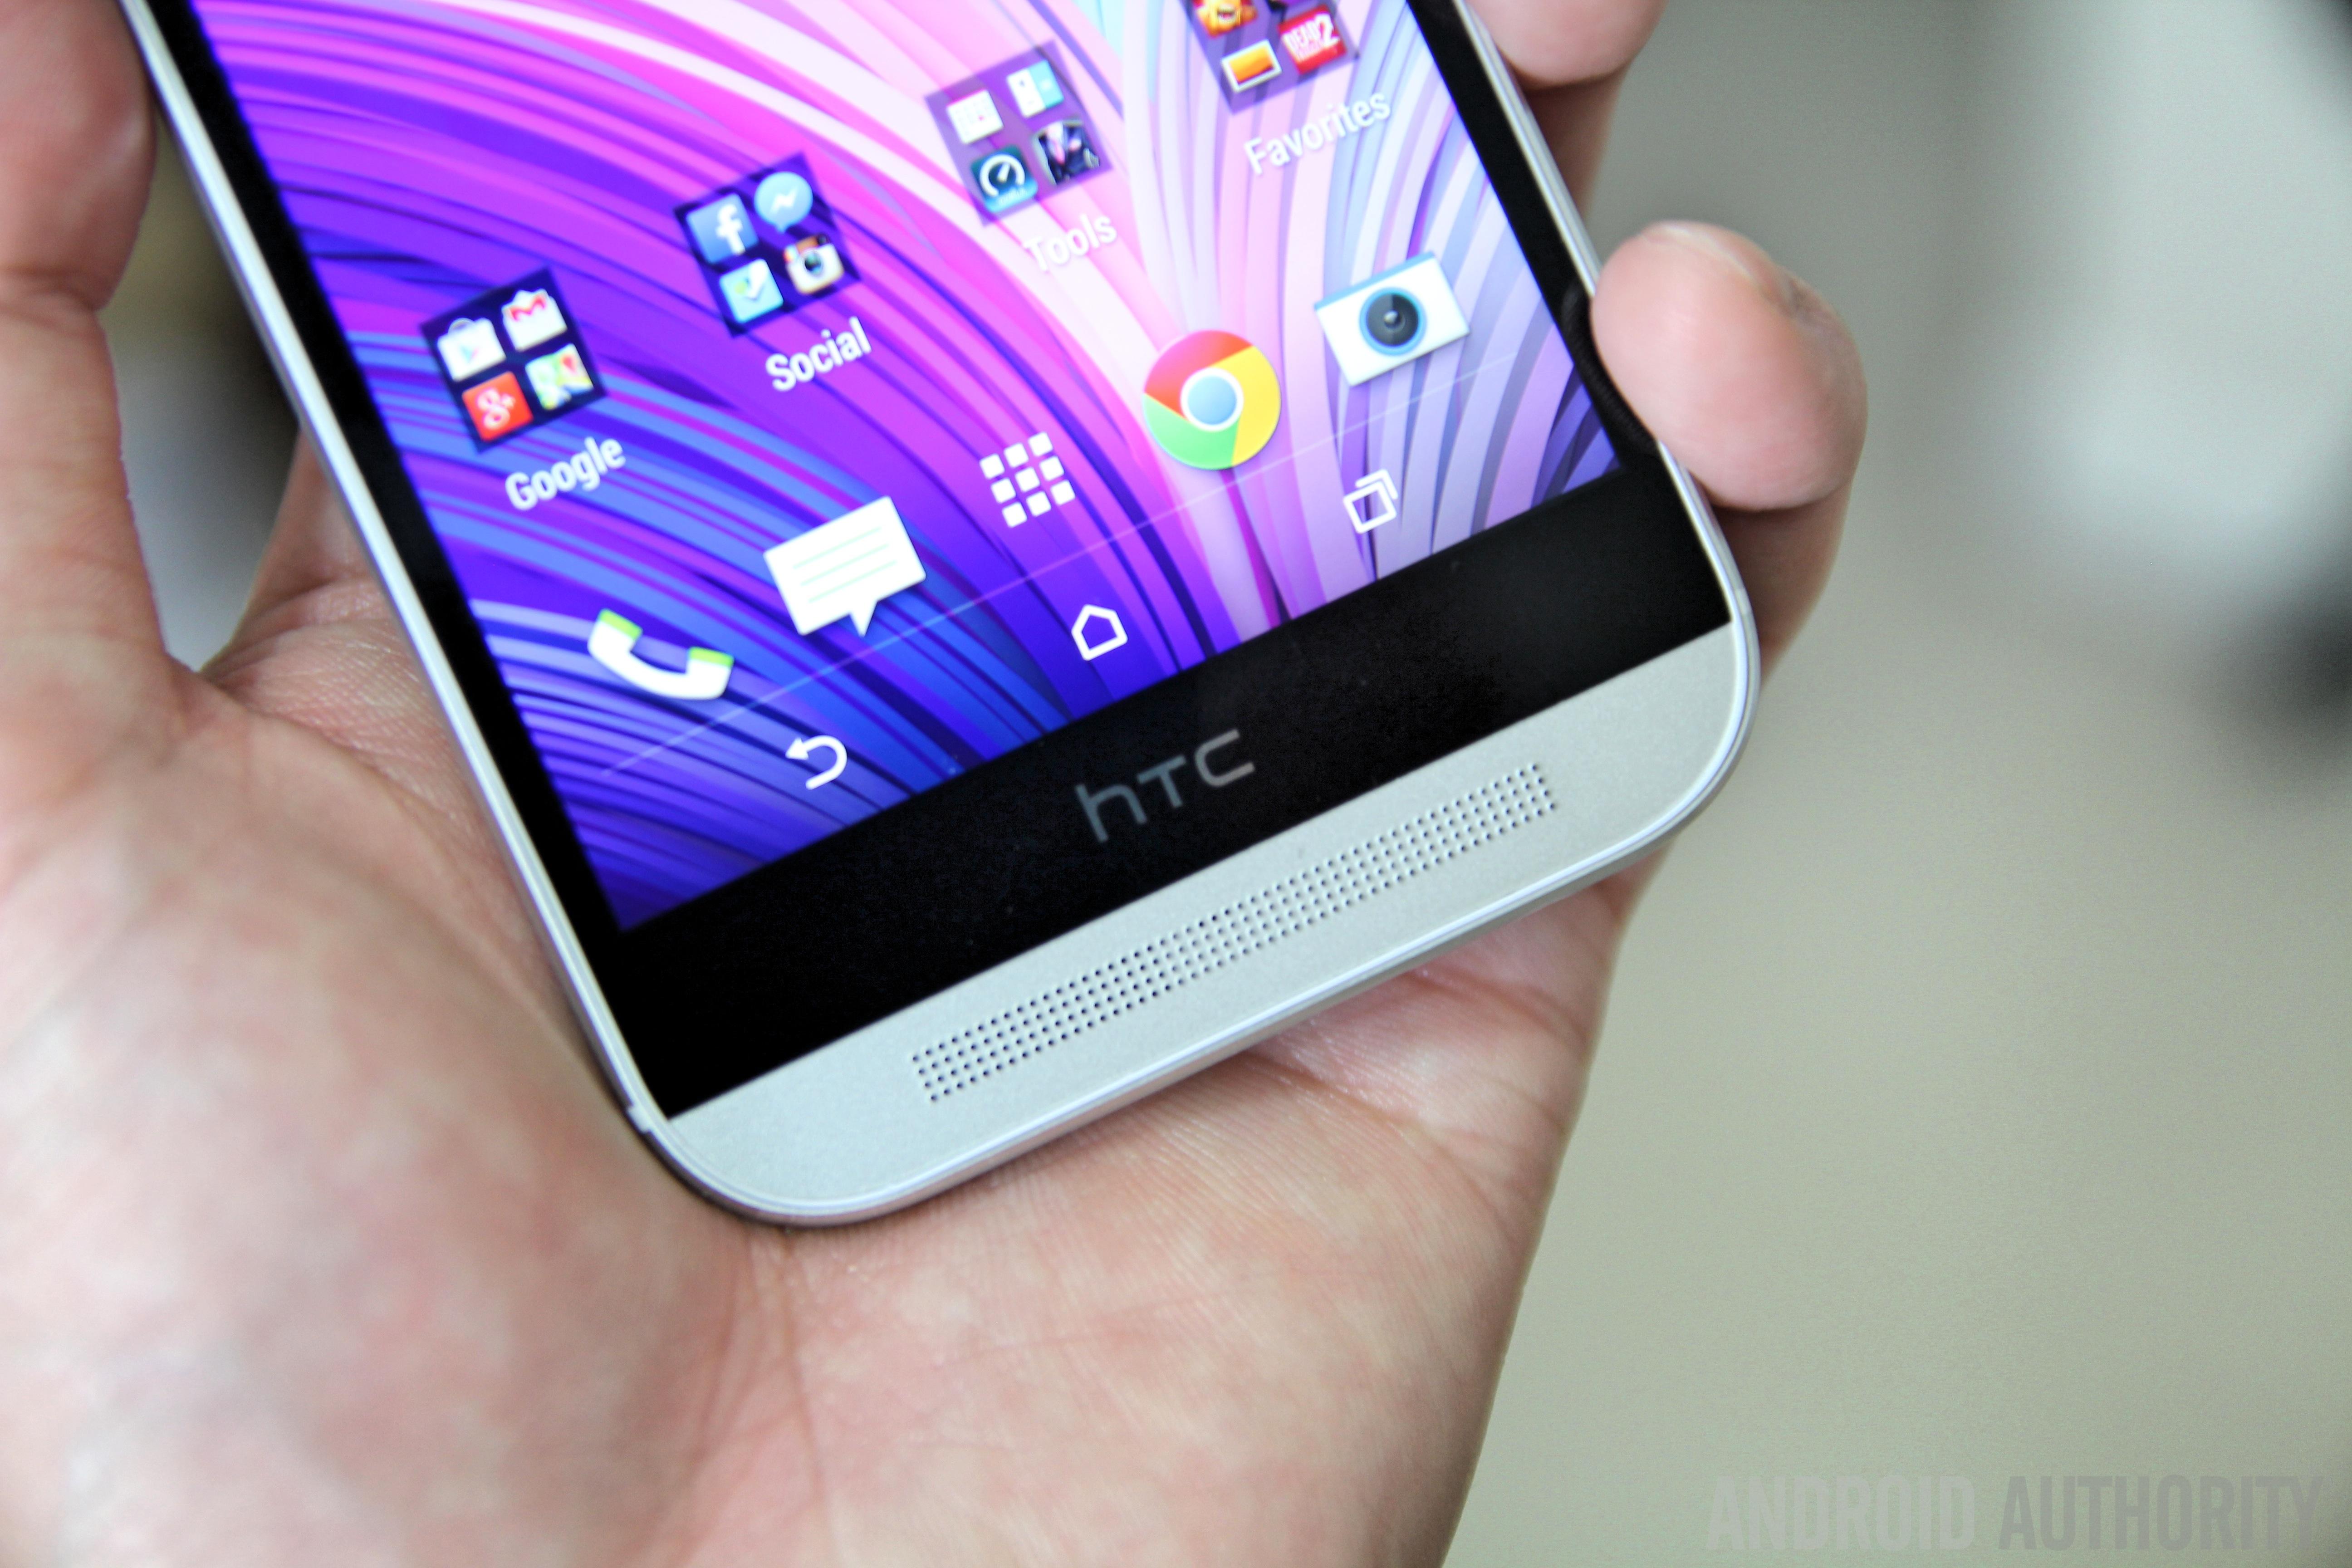 LG G3 Vs HTC One M8-52